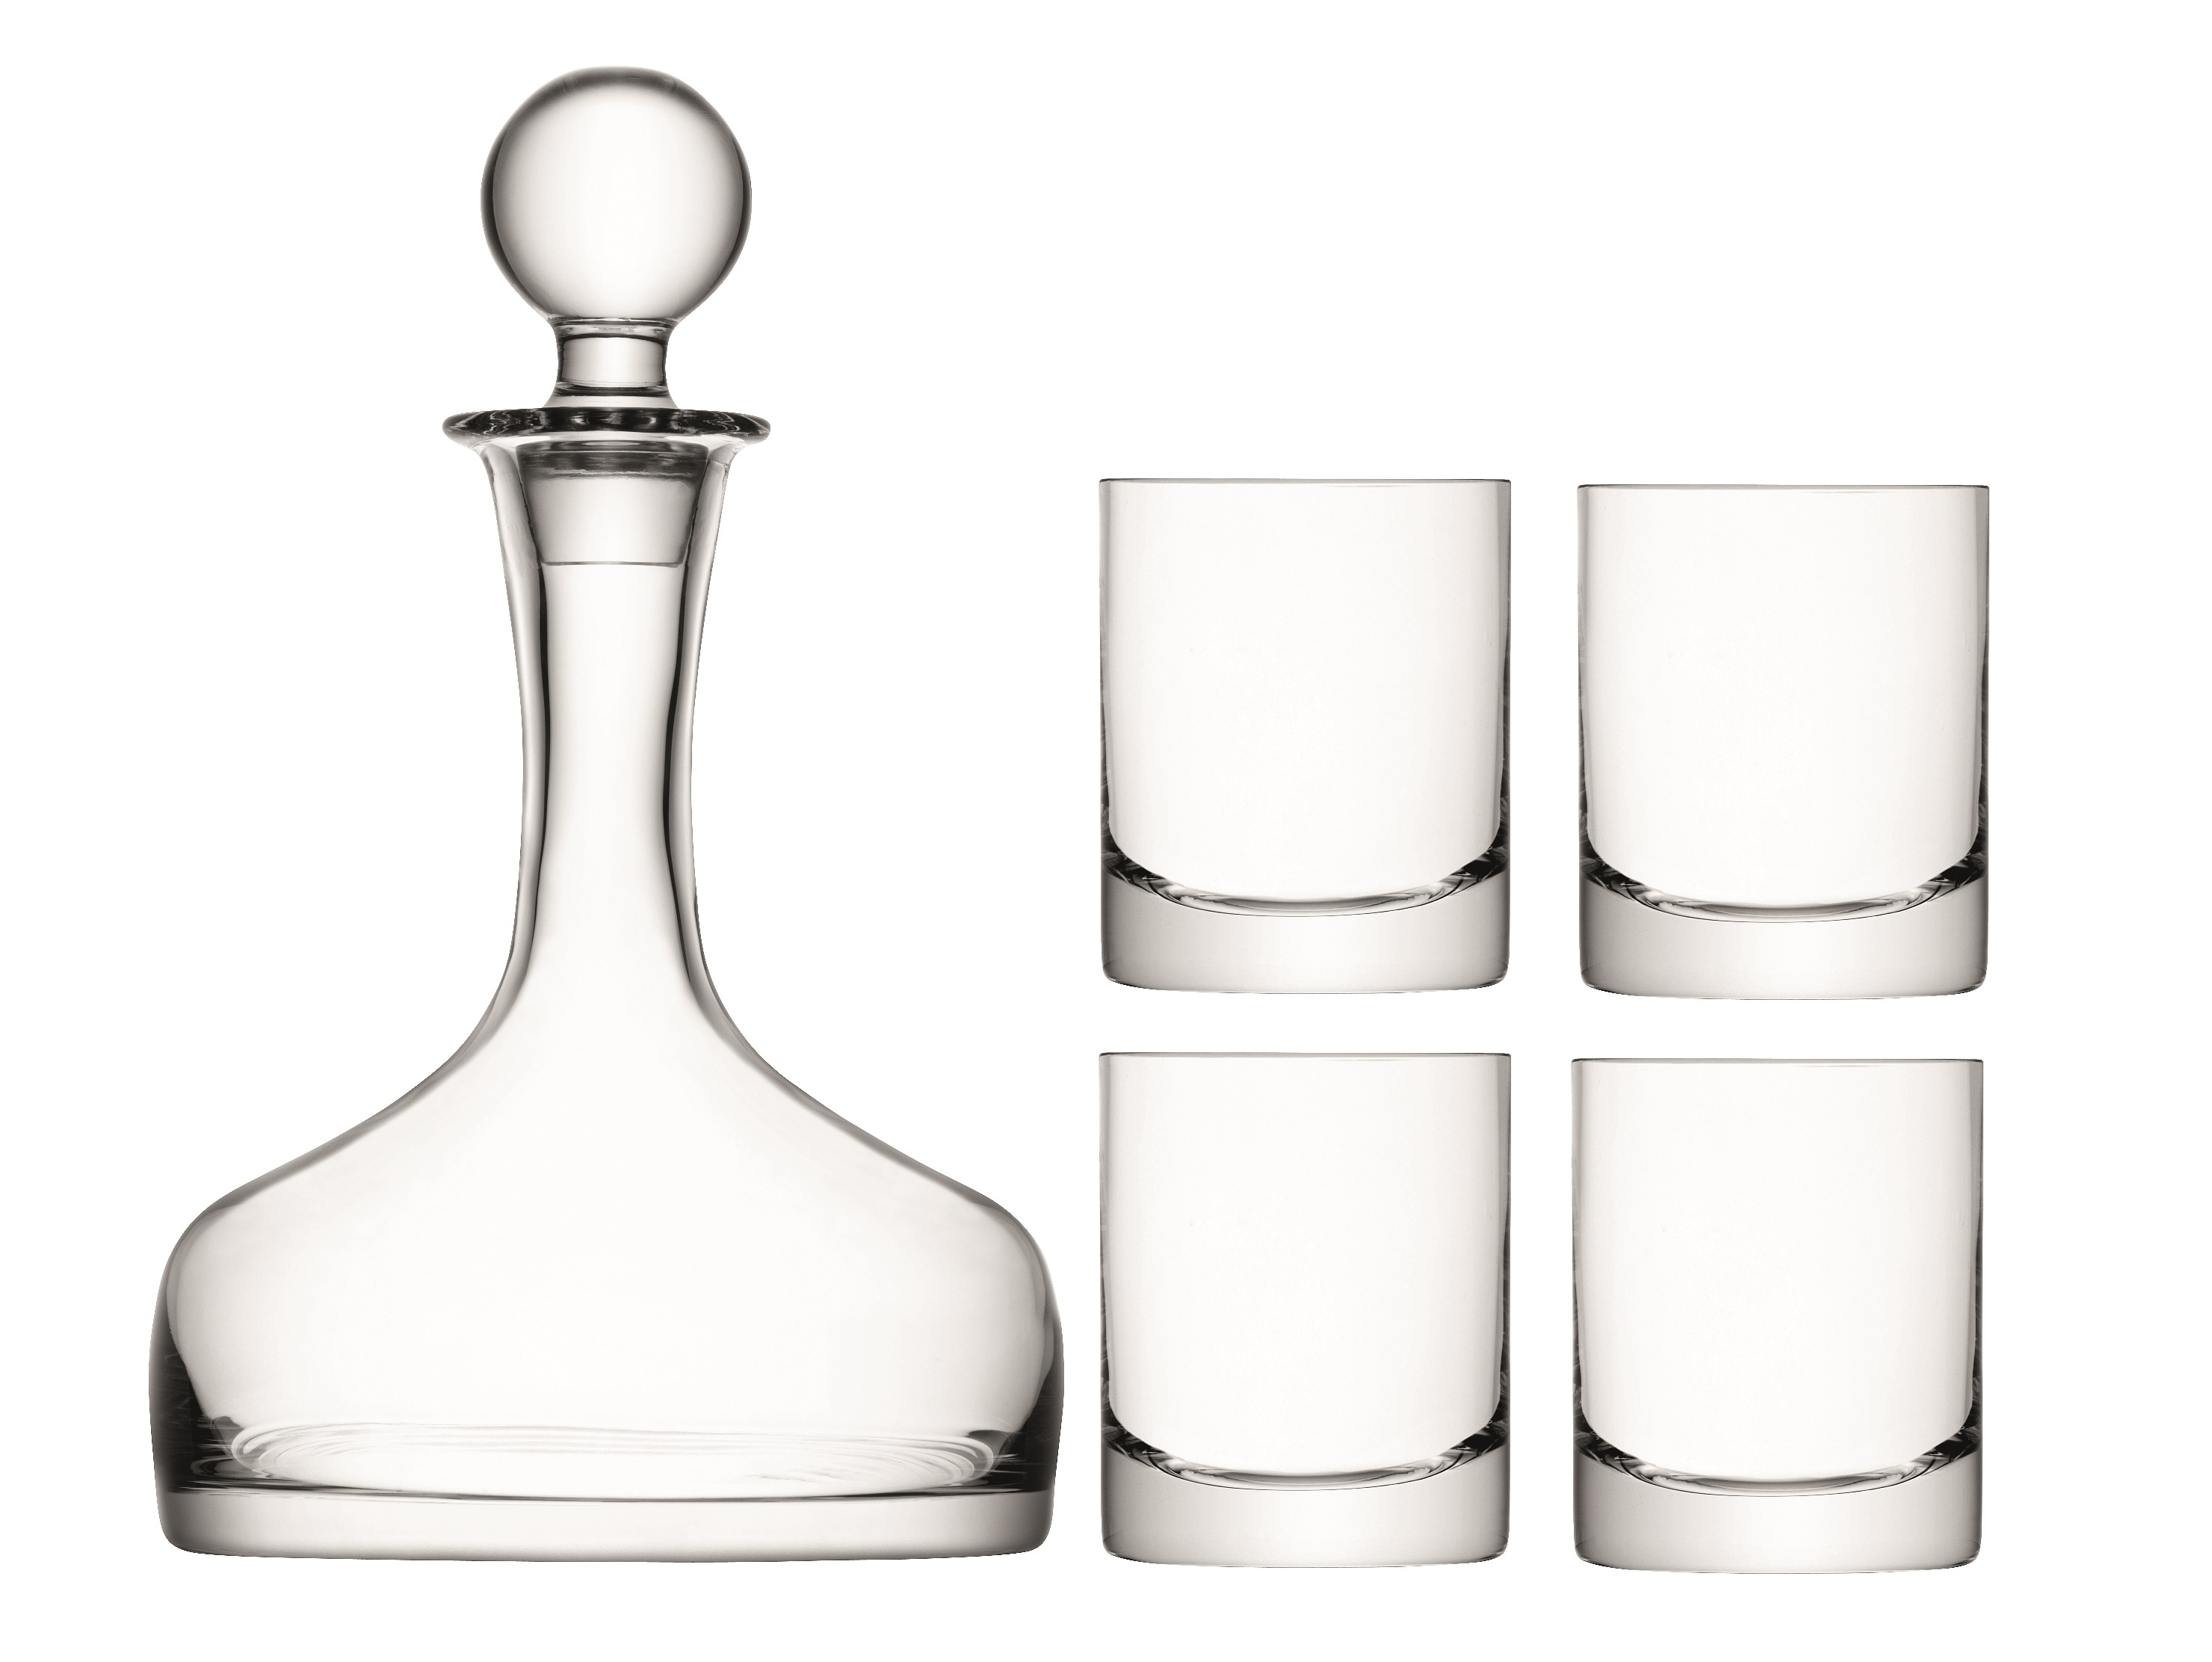 Набор для виски BAR (4 бокала, декантер)Кухонные наборы посуды<br>&amp;lt;div&amp;gt;Объём декантера: 1500 мл.&amp;lt;/div&amp;gt;&amp;lt;div&amp;gt;Объём бокалов: 250 мл.&amp;lt;/div&amp;gt;<br><br>Material: Стекло